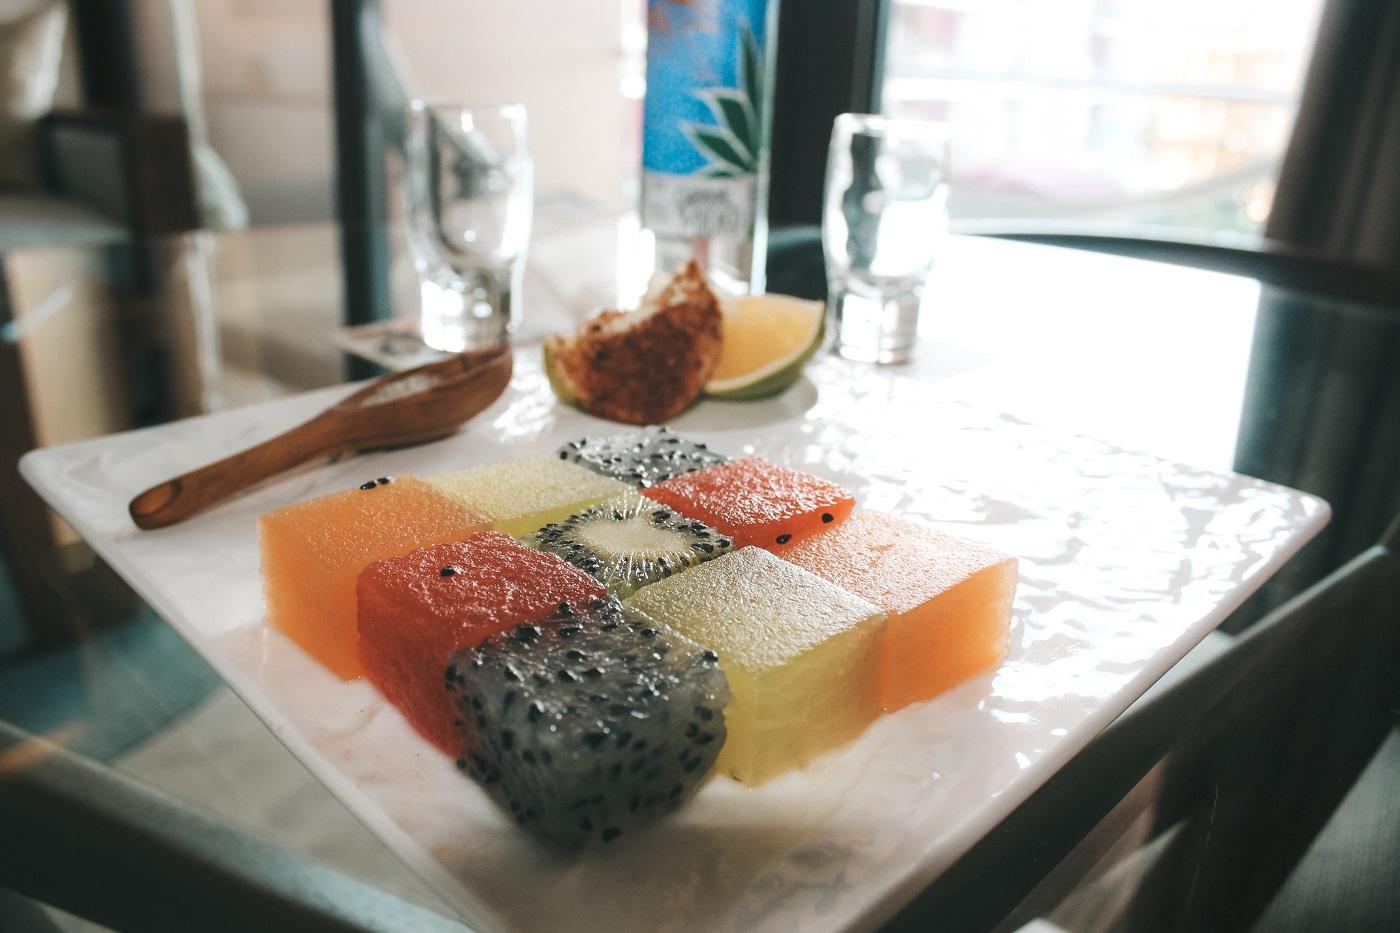 Frutas na suíte do hotel (Foto: Tati Sisti)